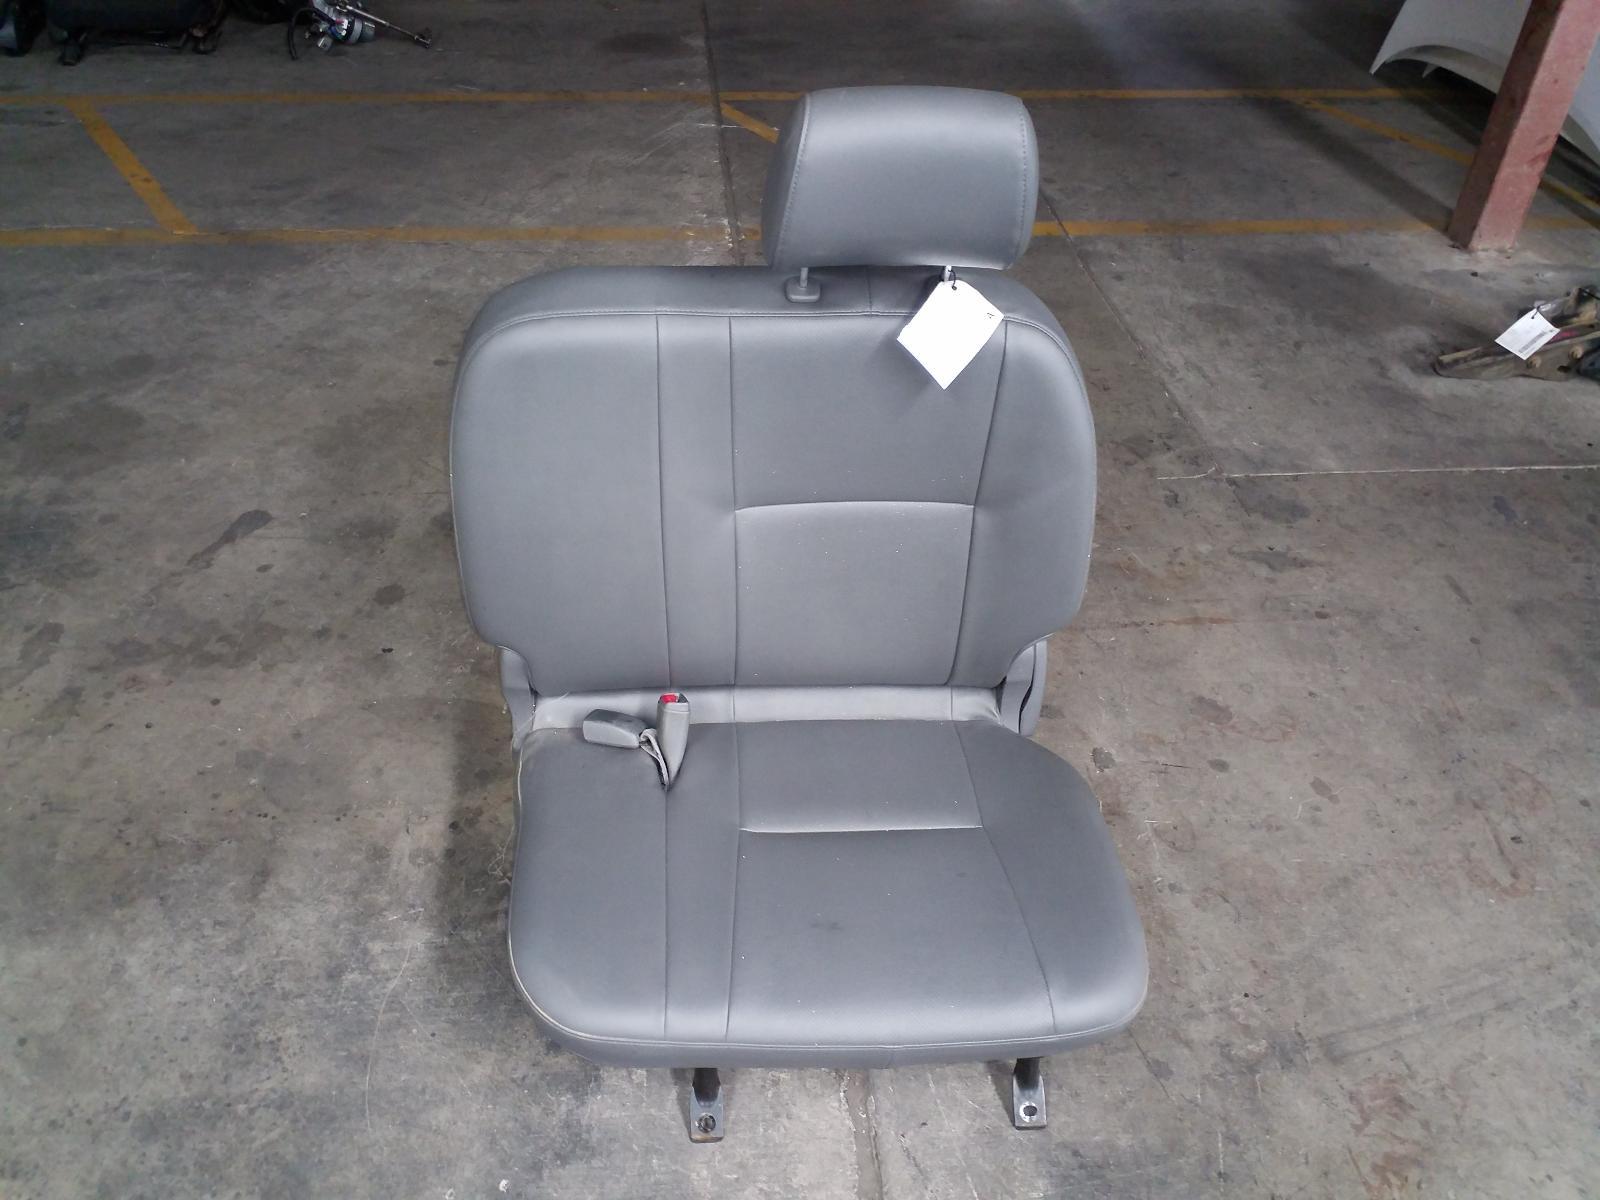 Toyota Hilux Front Seat Lh 3 4 Bench Seat Vinyl 07 11 10